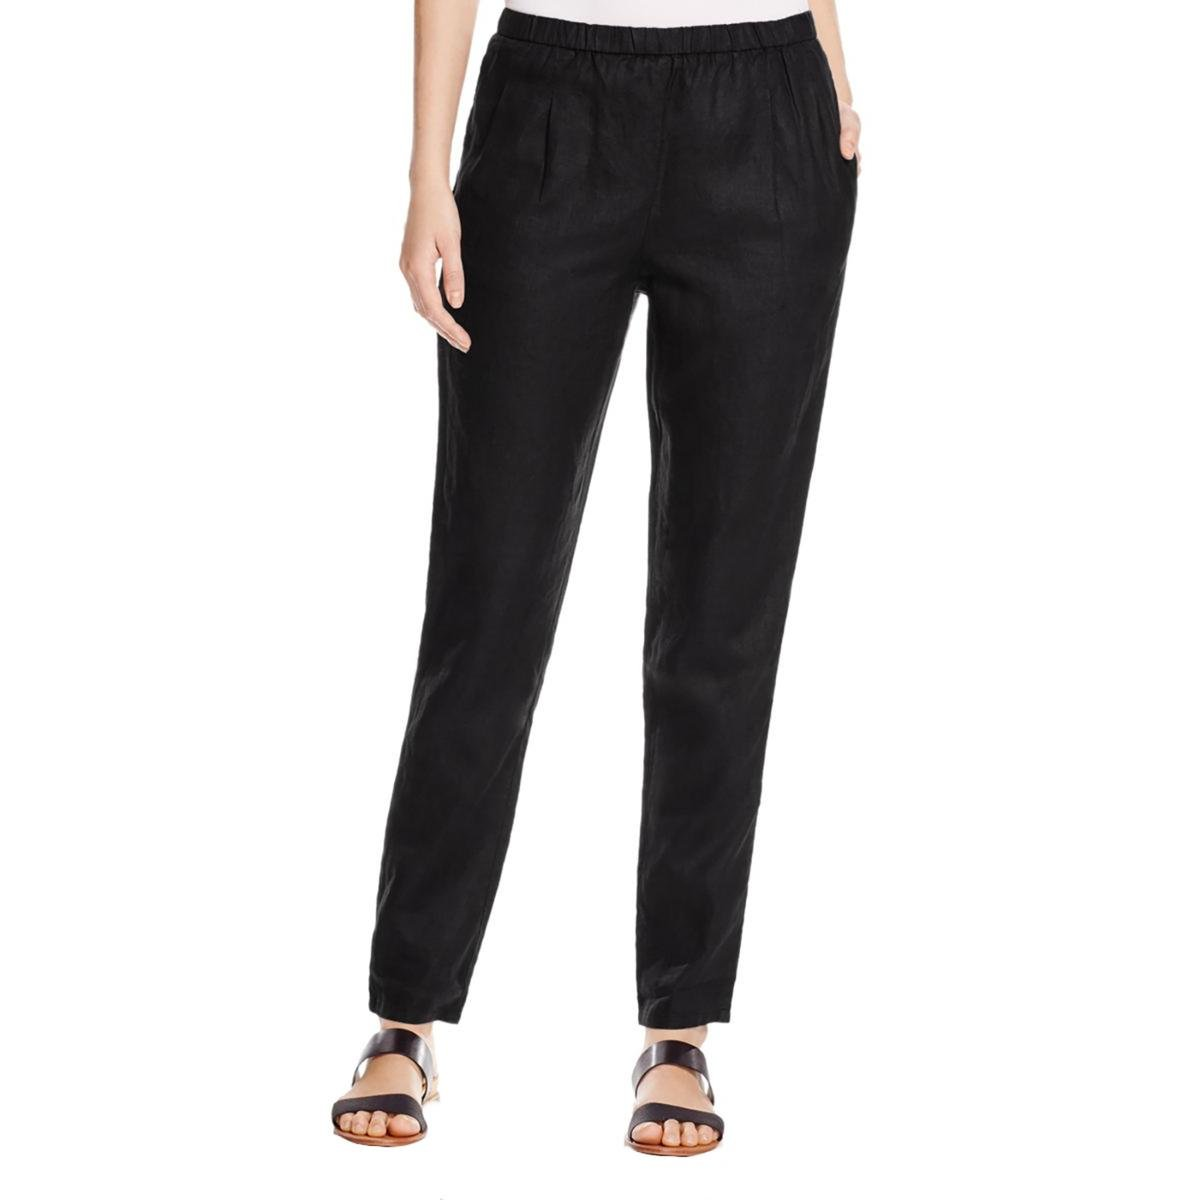 Eileen Fisher Women's Slouchy Pants (Black, Small)